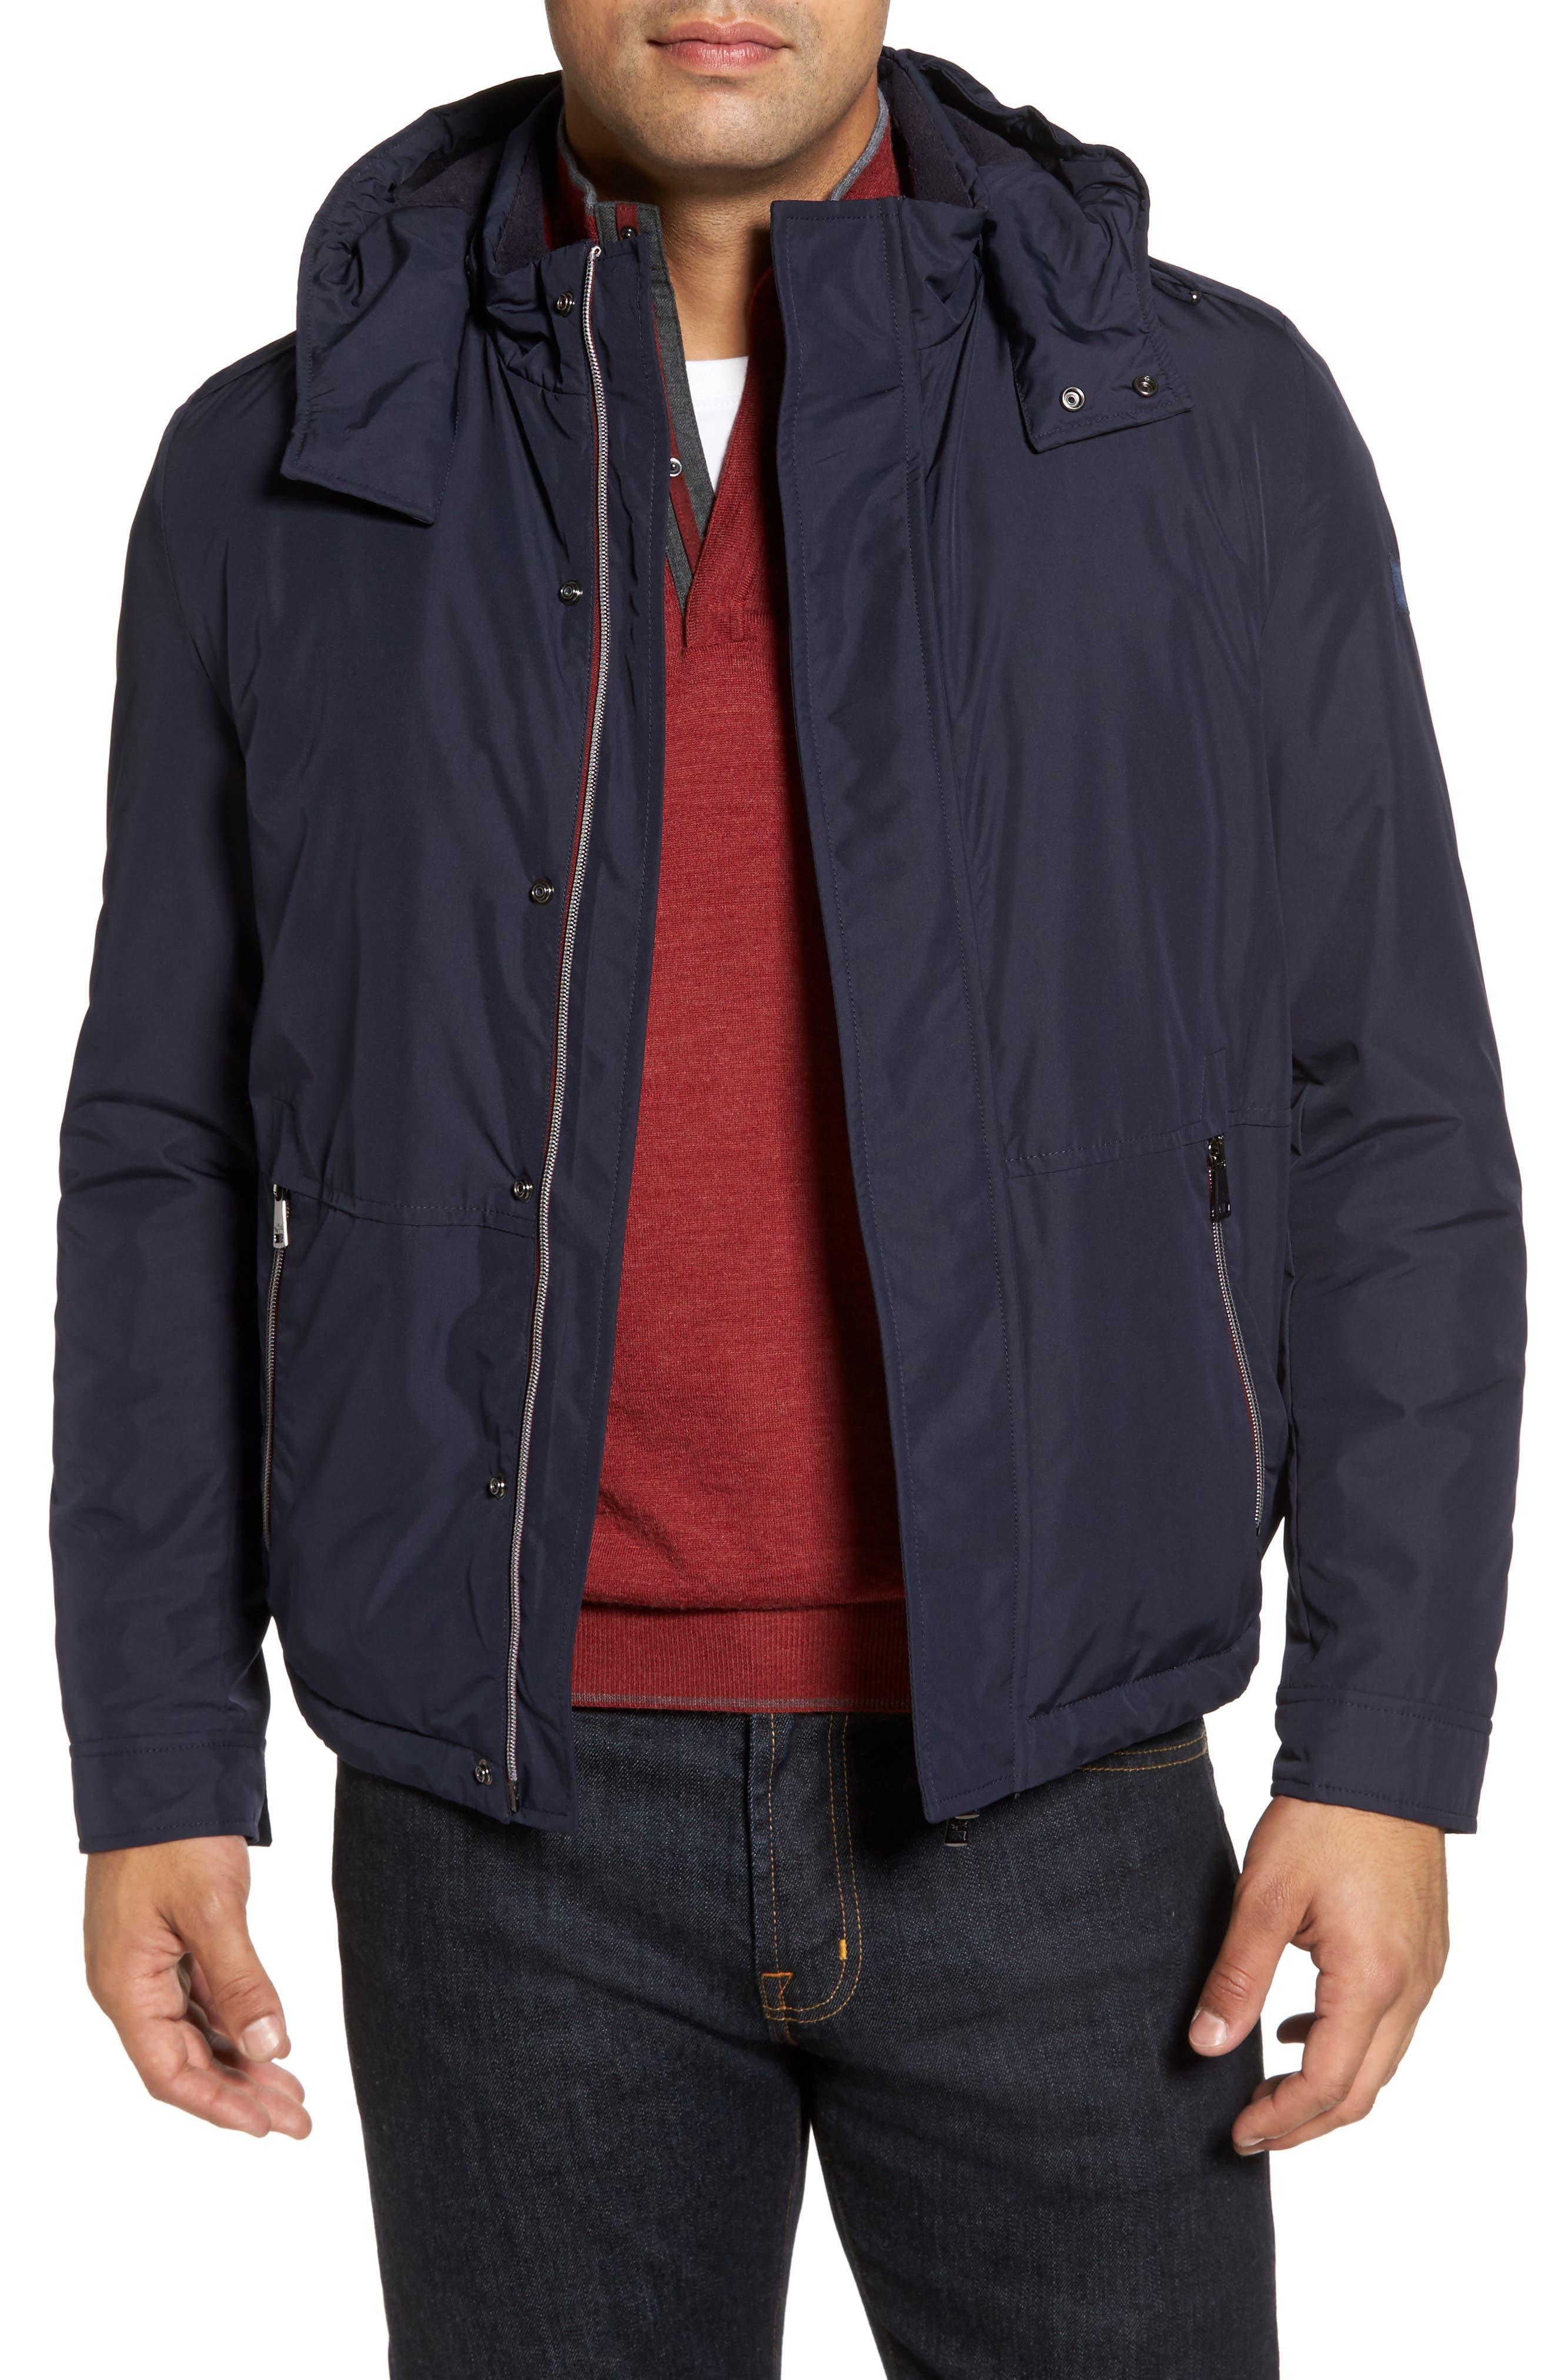 Main Image - Paul & Shark Fleece Lined Hooded Jacket